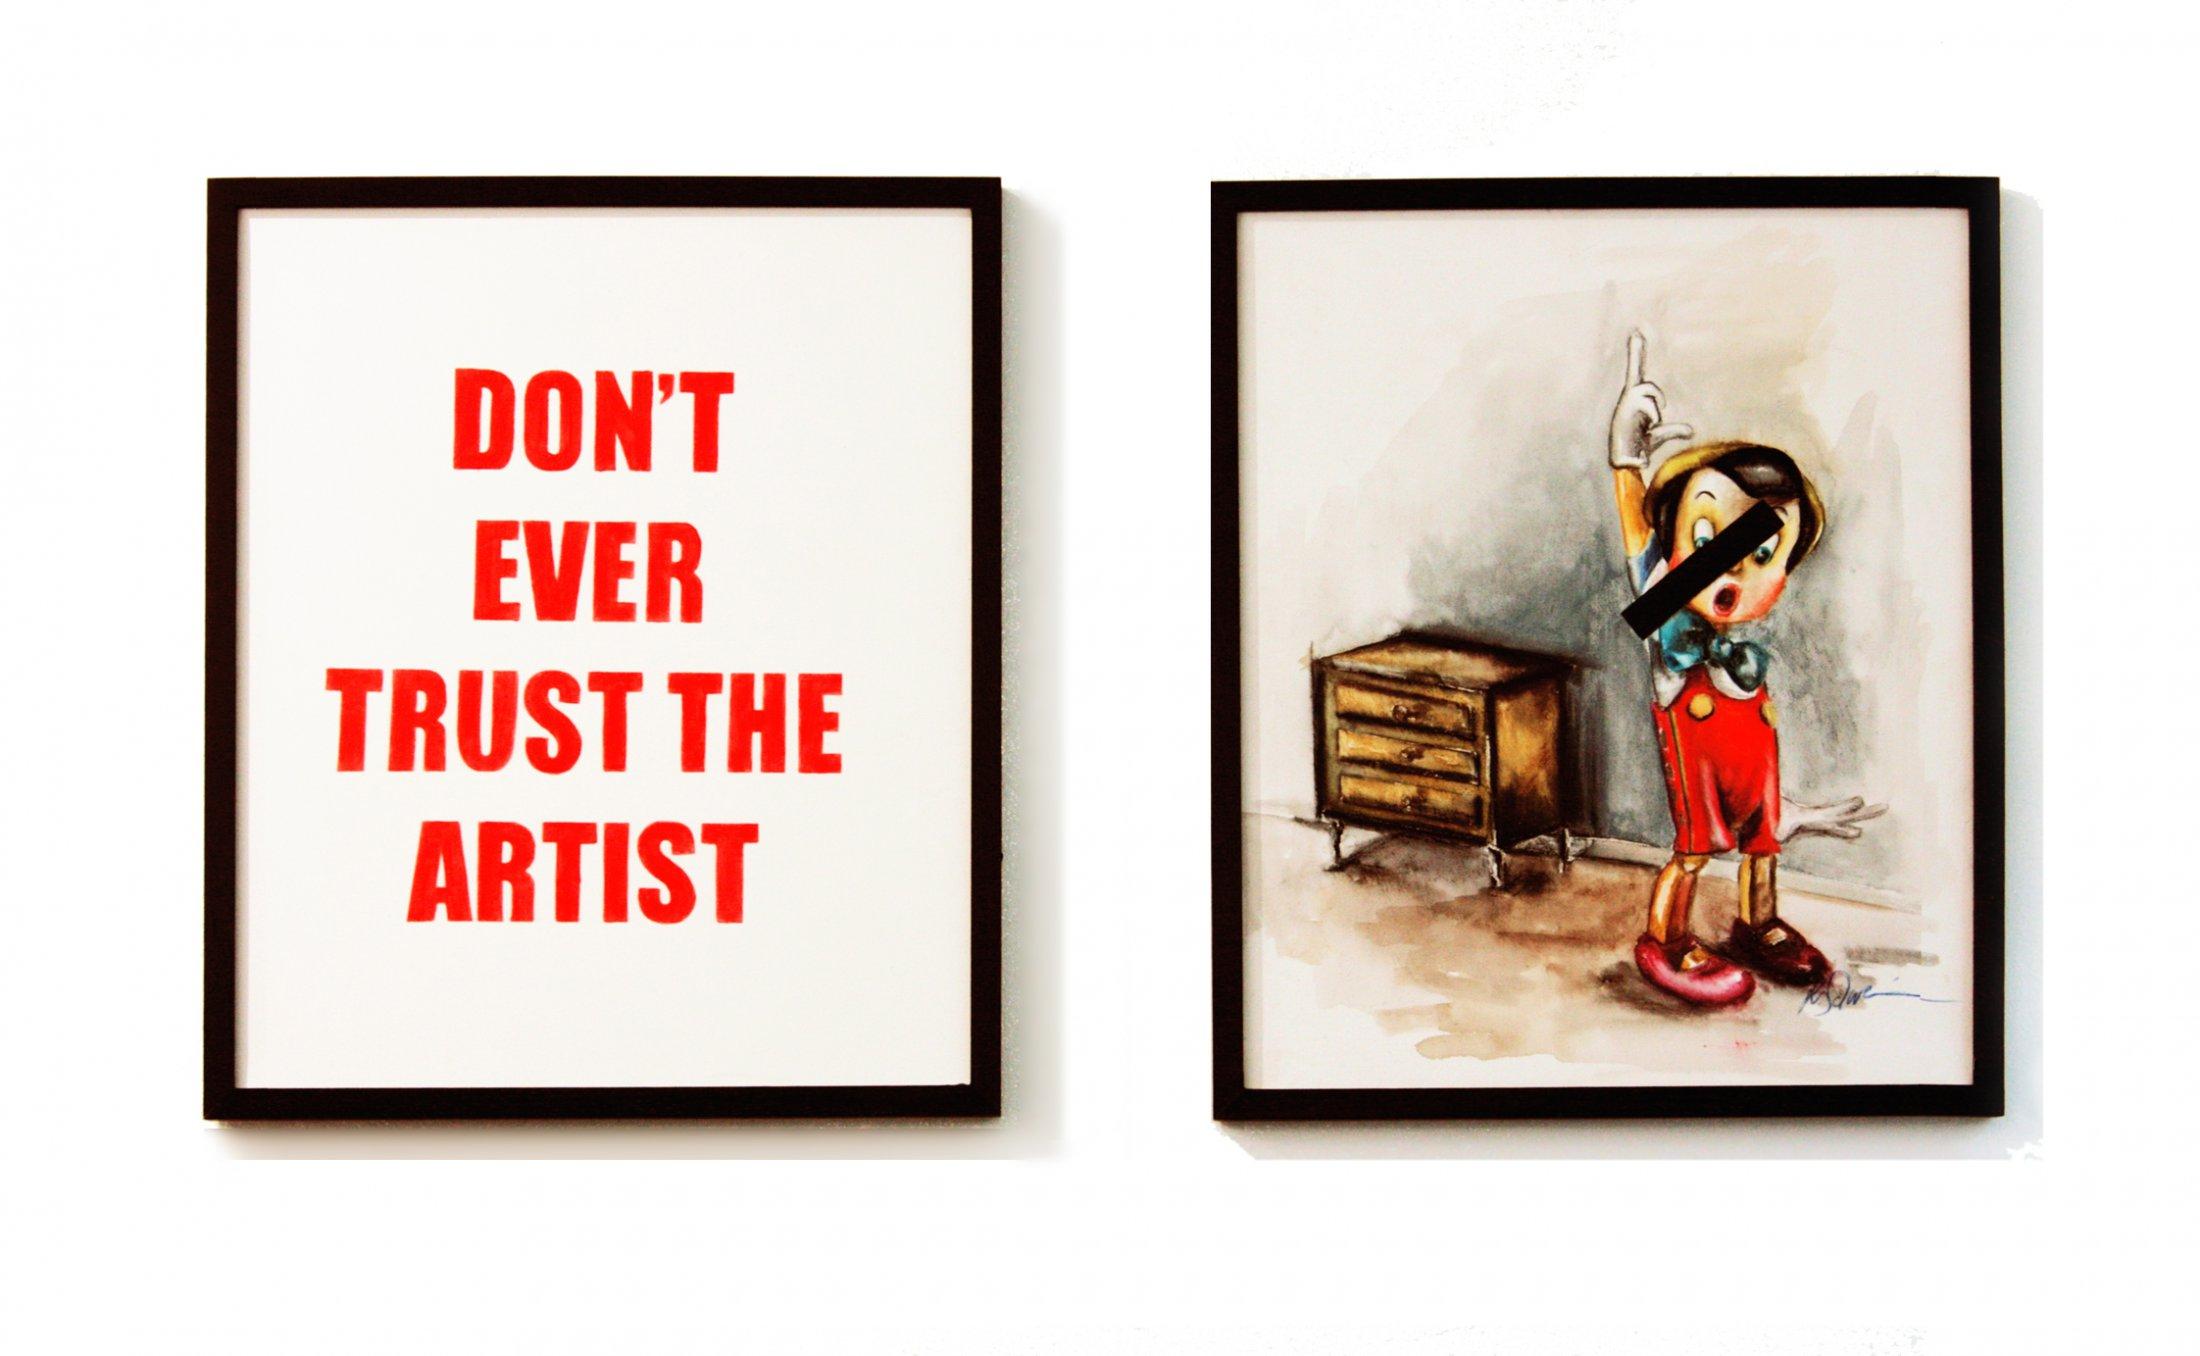 dont trust the artist